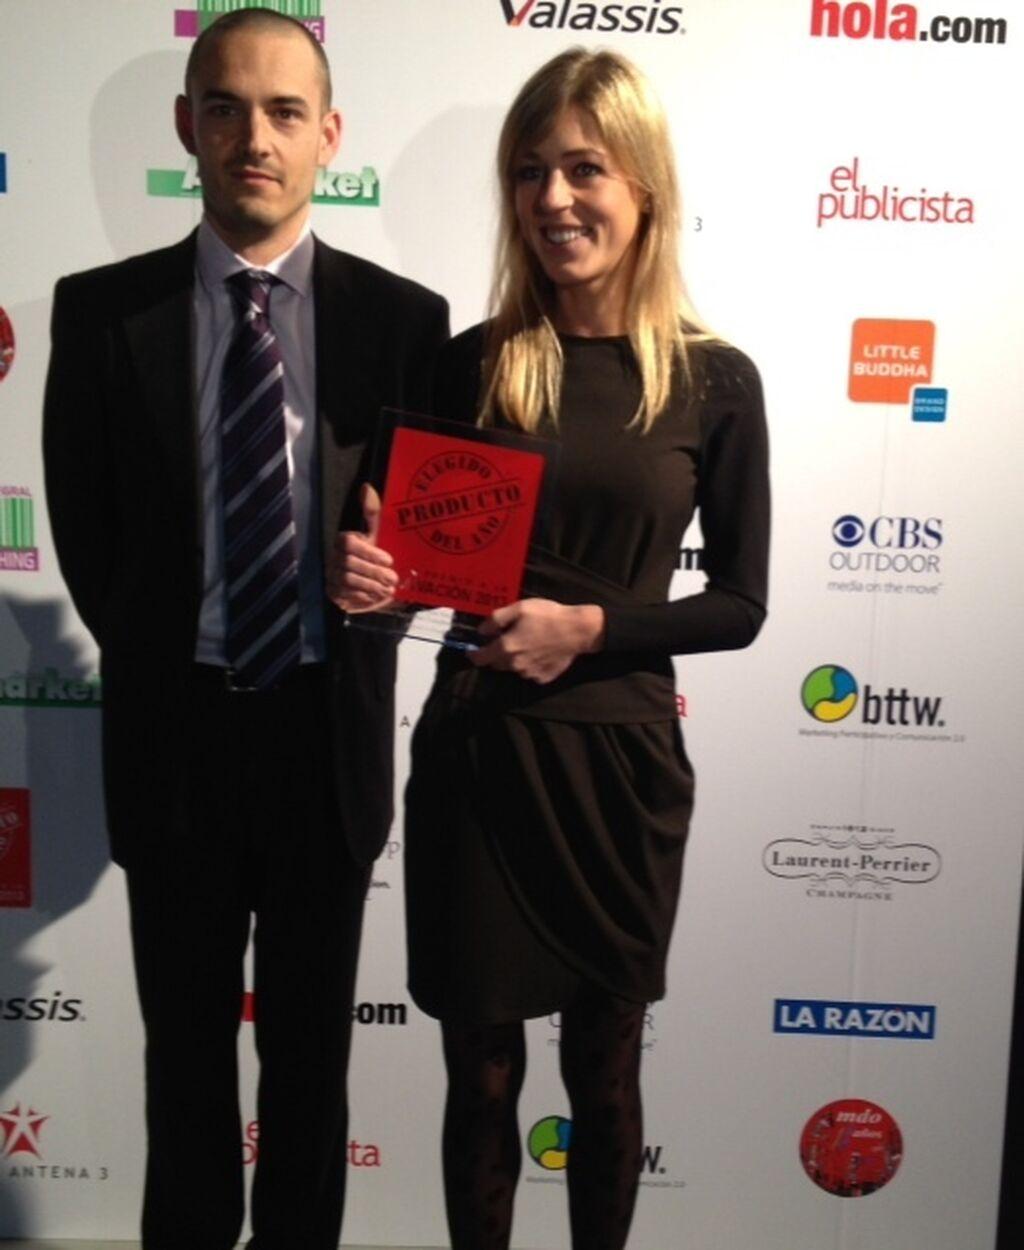 Gemma Recasens, BM Nuts de PepsiCo Foods. Premio a Cacahuetes Sal y Miel tostados al horno de Matutano (Frutos Secos)